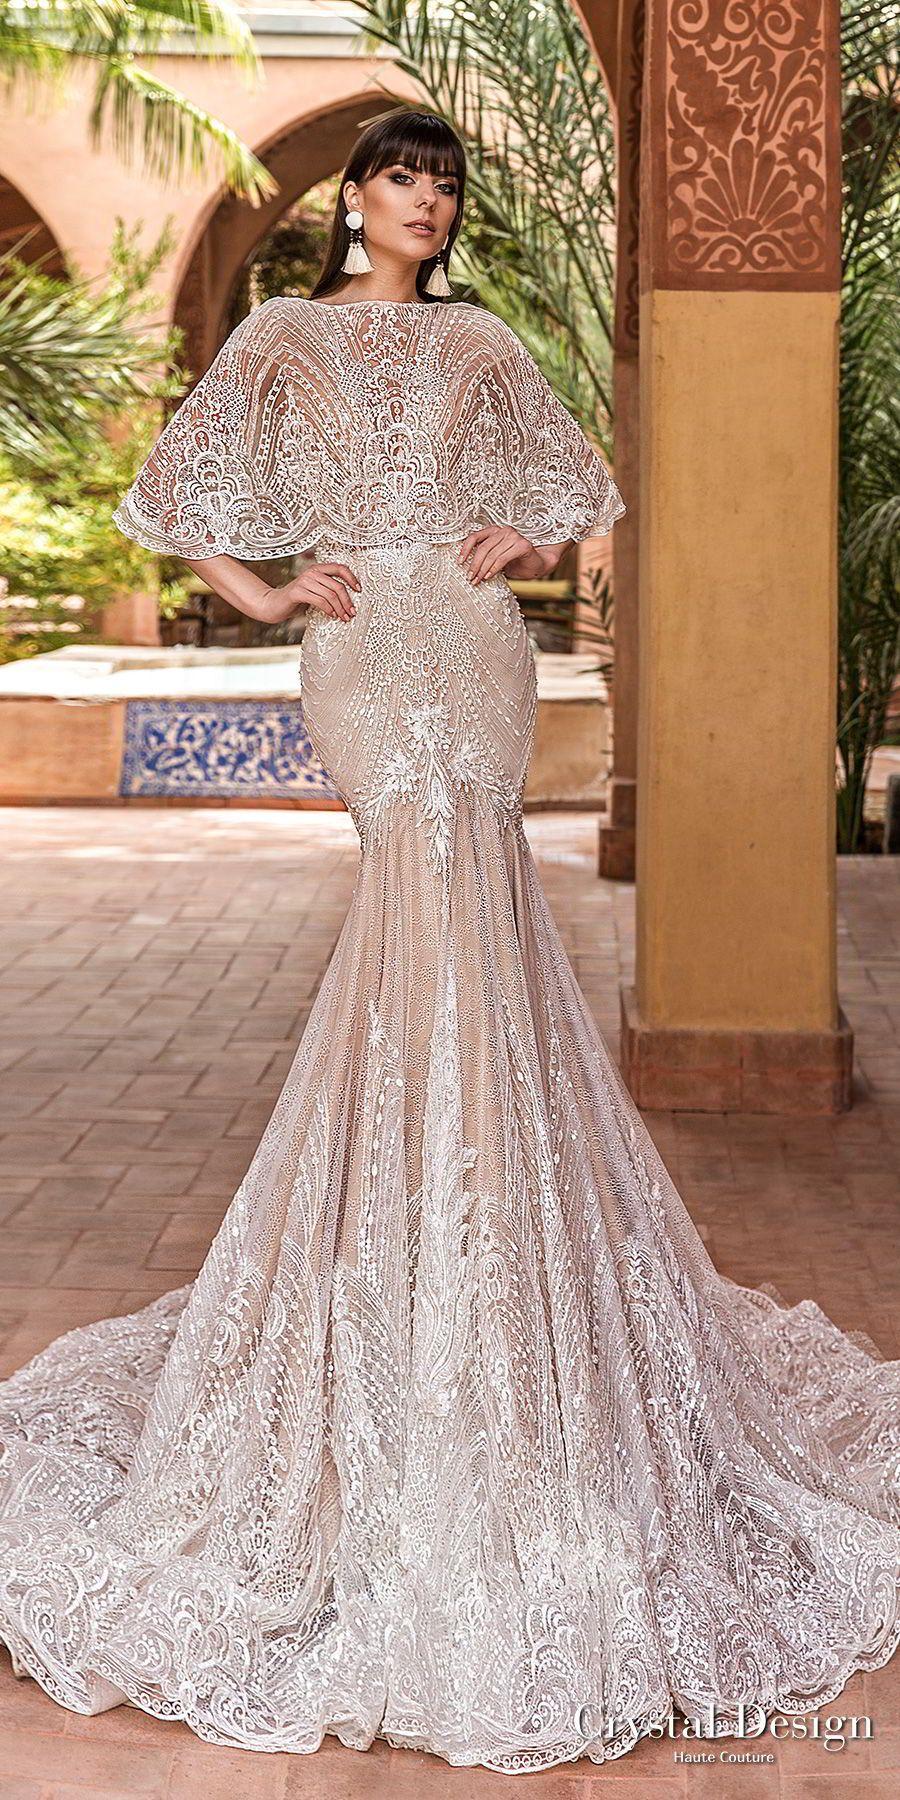 Crystal Design 2018 Cap Sleeves Deep V Neck Full Embellishment Elegant Trumpet Wedding Dress Capelet Open Back Chapel Train Liberty Mv